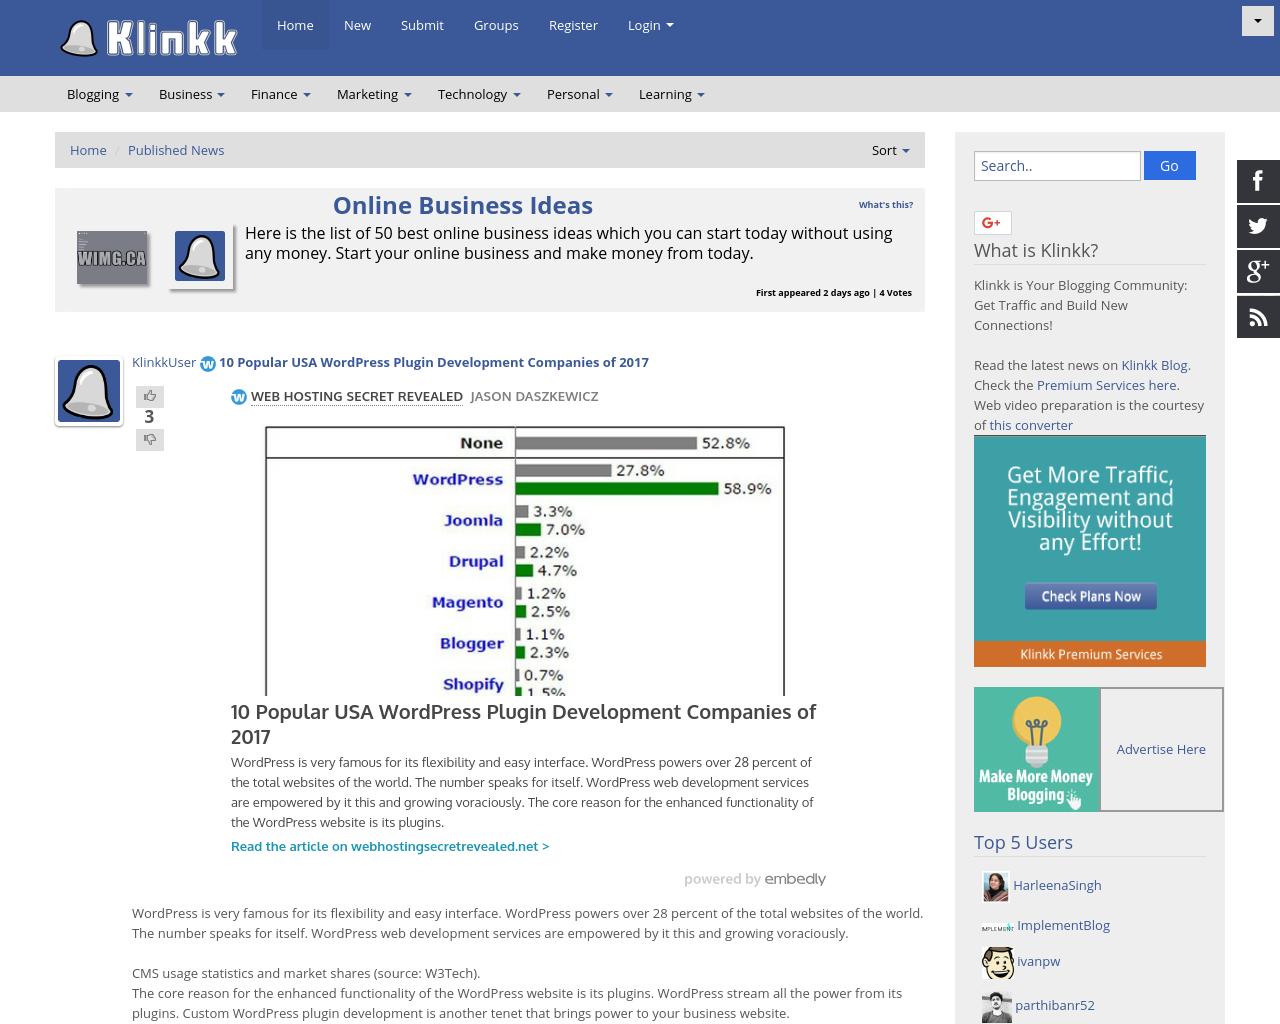 Klinkk-Advertising-Reviews-Pricing